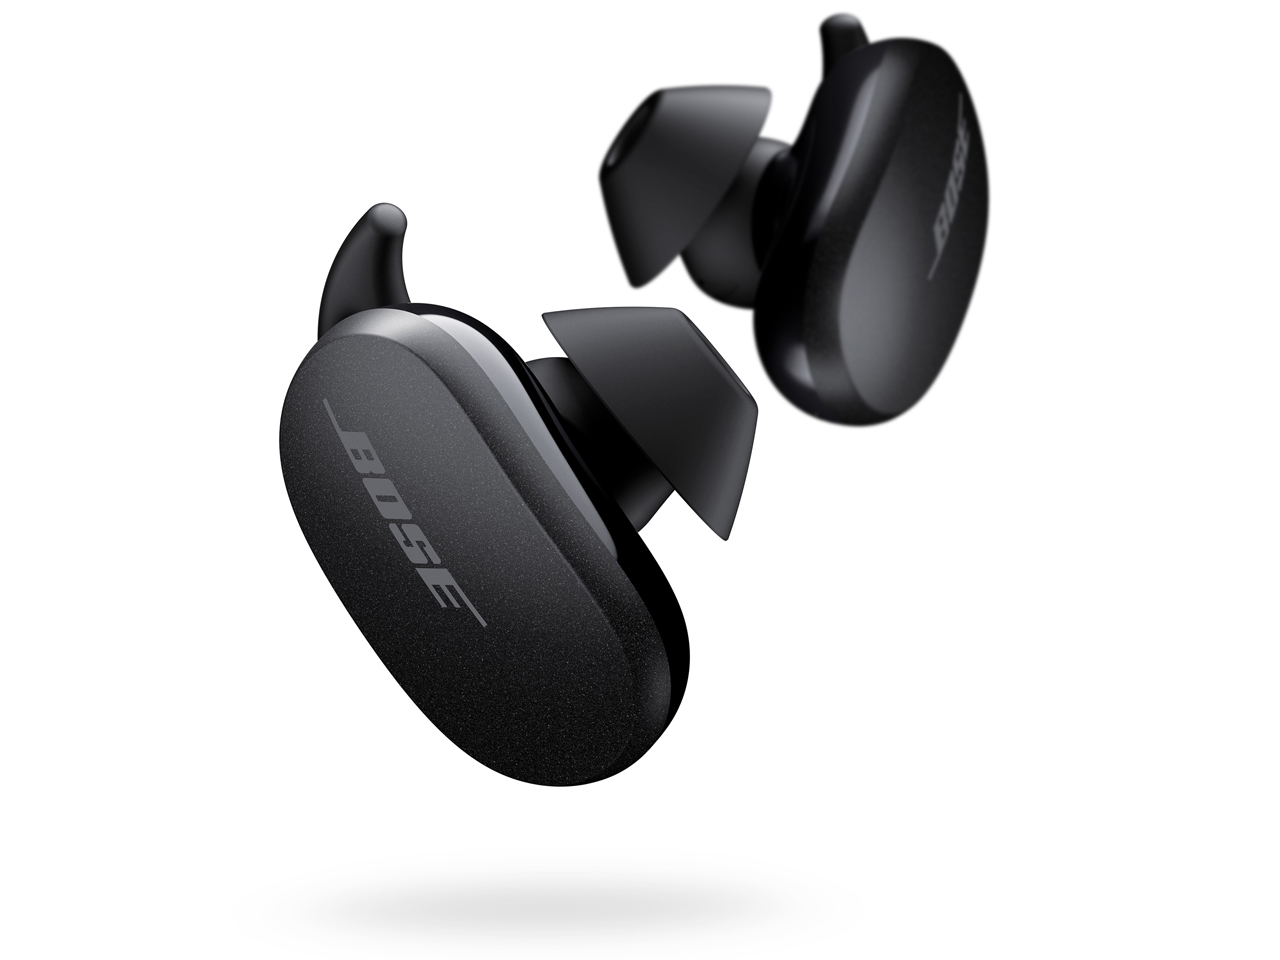 QuietComfort Earbuds [トリプルブラック] の製品画像